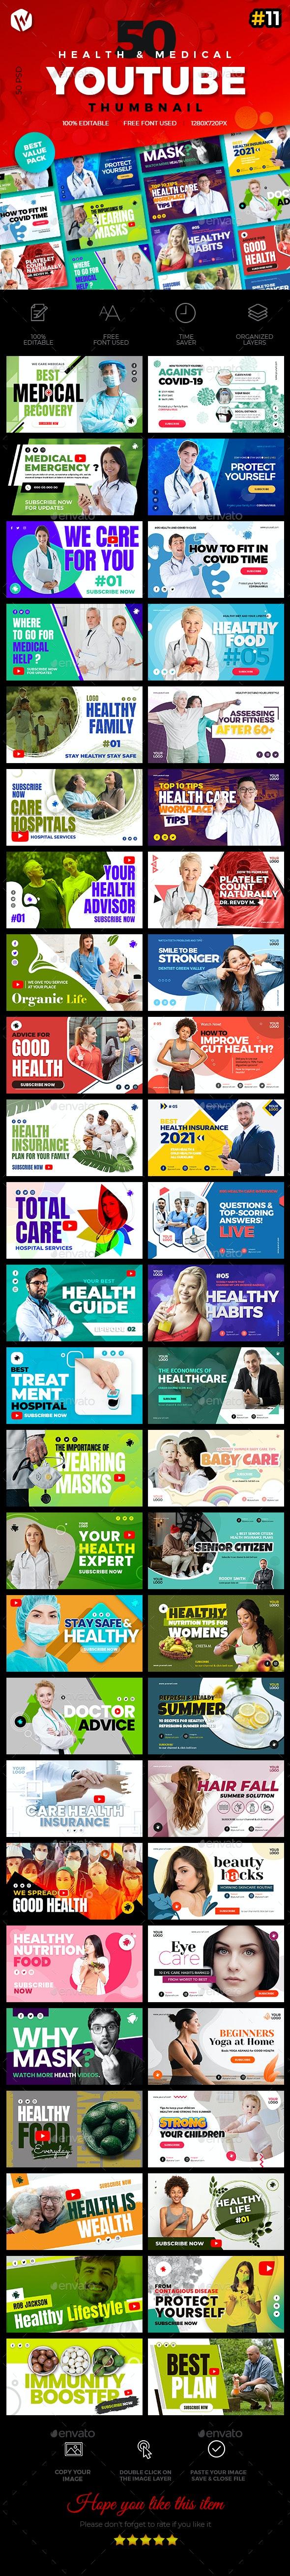 50 Youtube Thumbnail  Health & Medical - V11 - YouTube Social Media